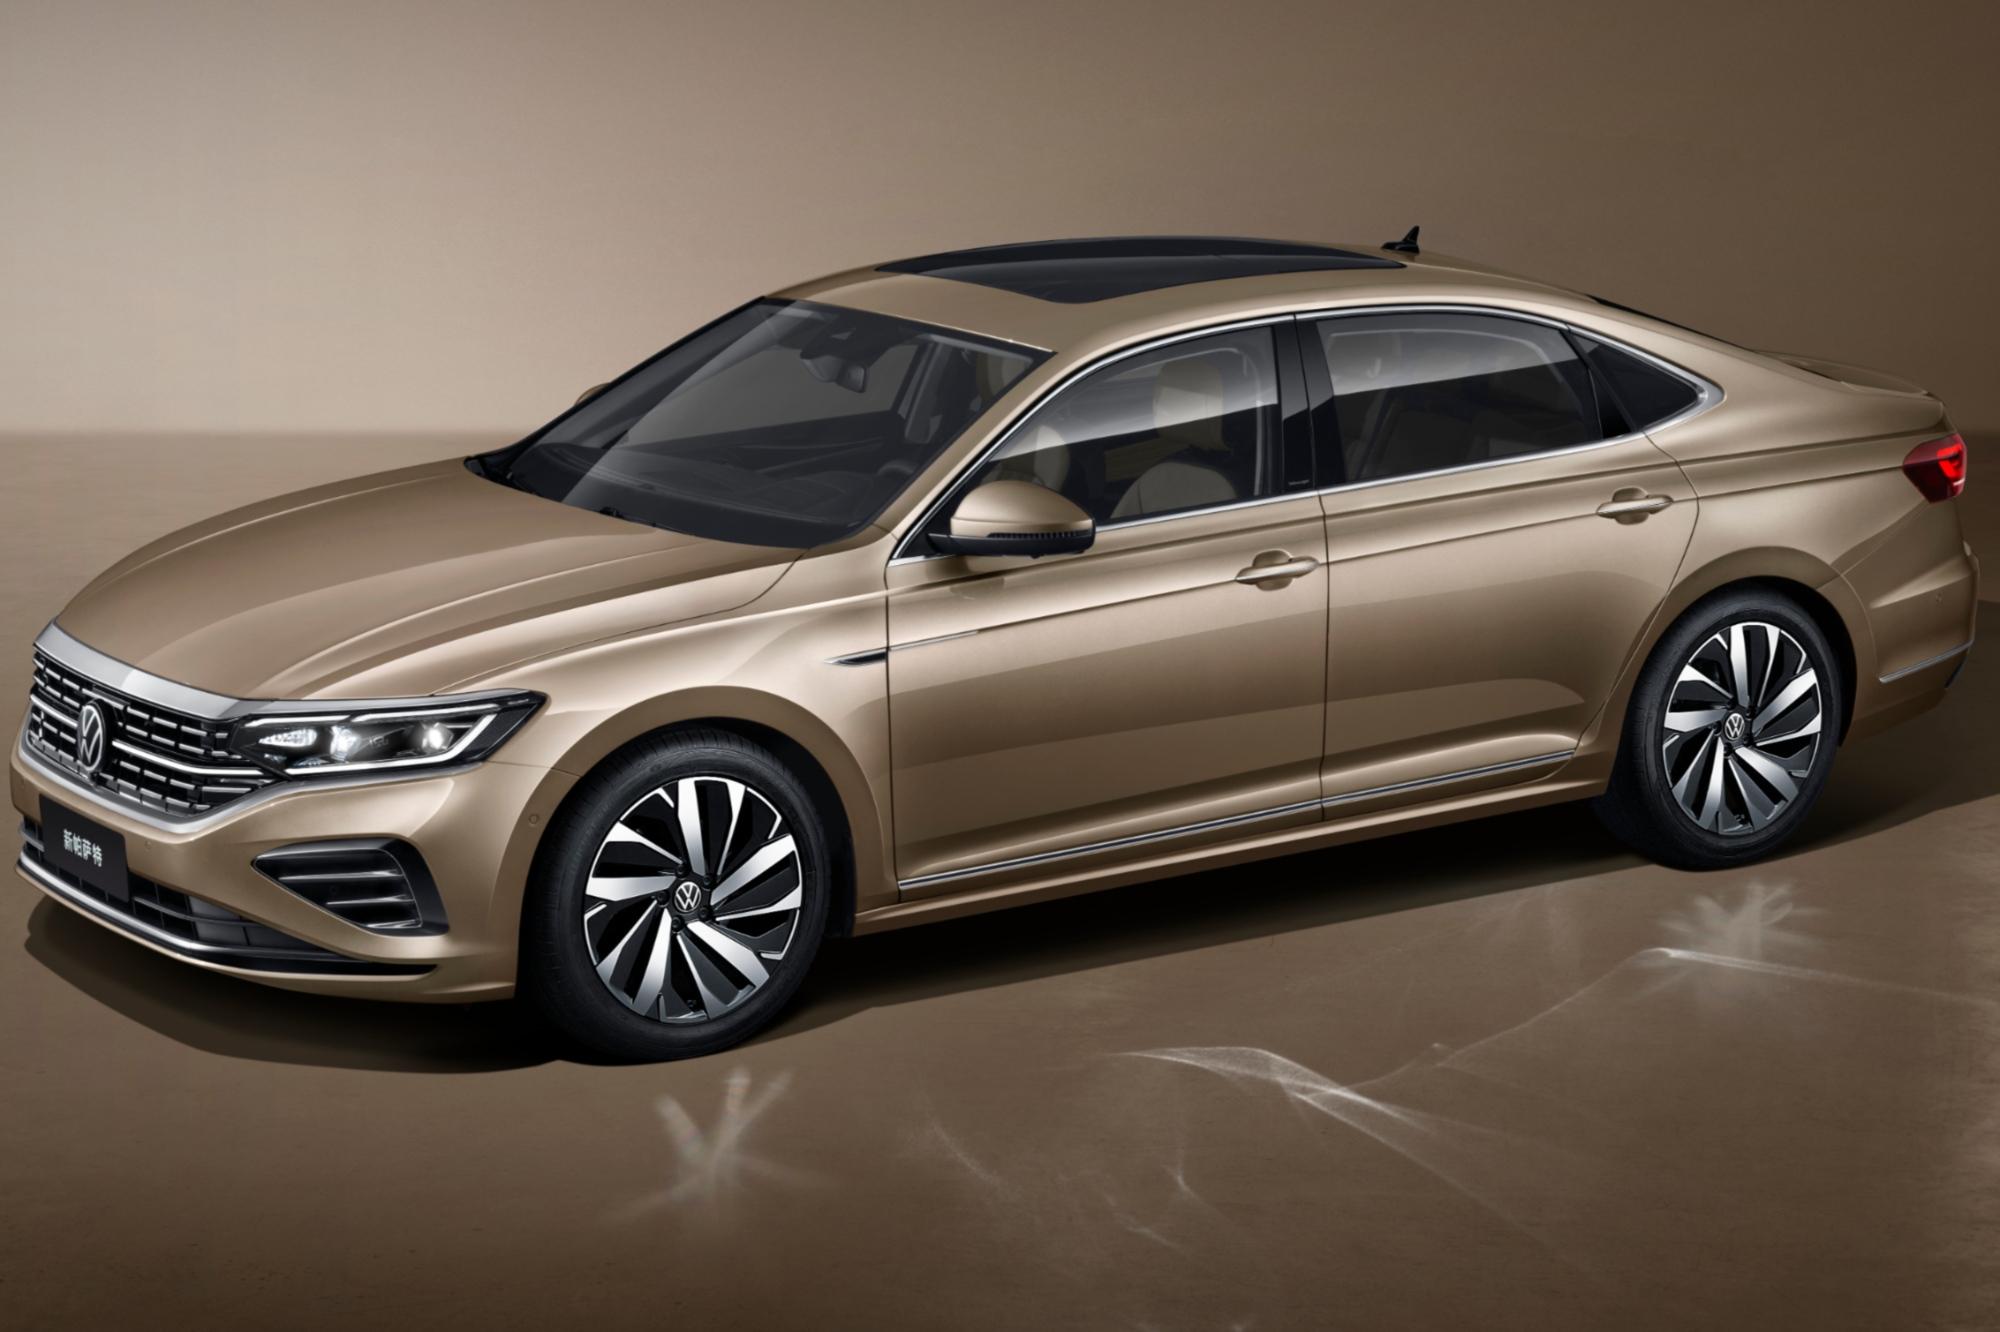 Novo Volkswagen Passat 2021 China